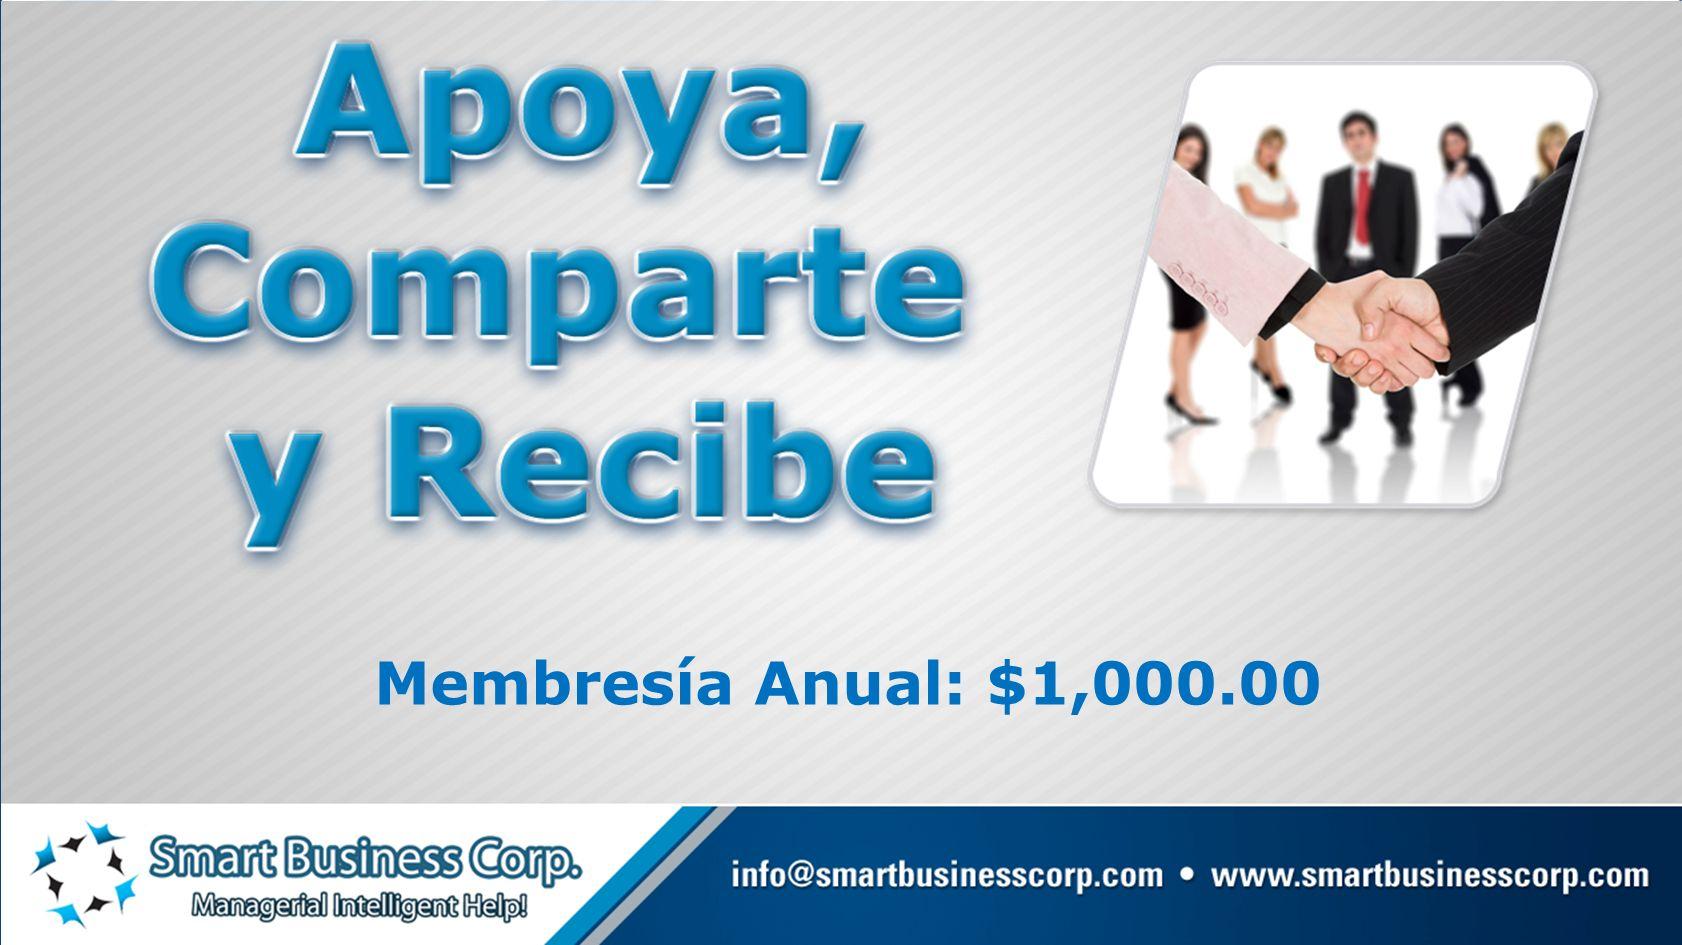 Membresía Anual: $1,000.00